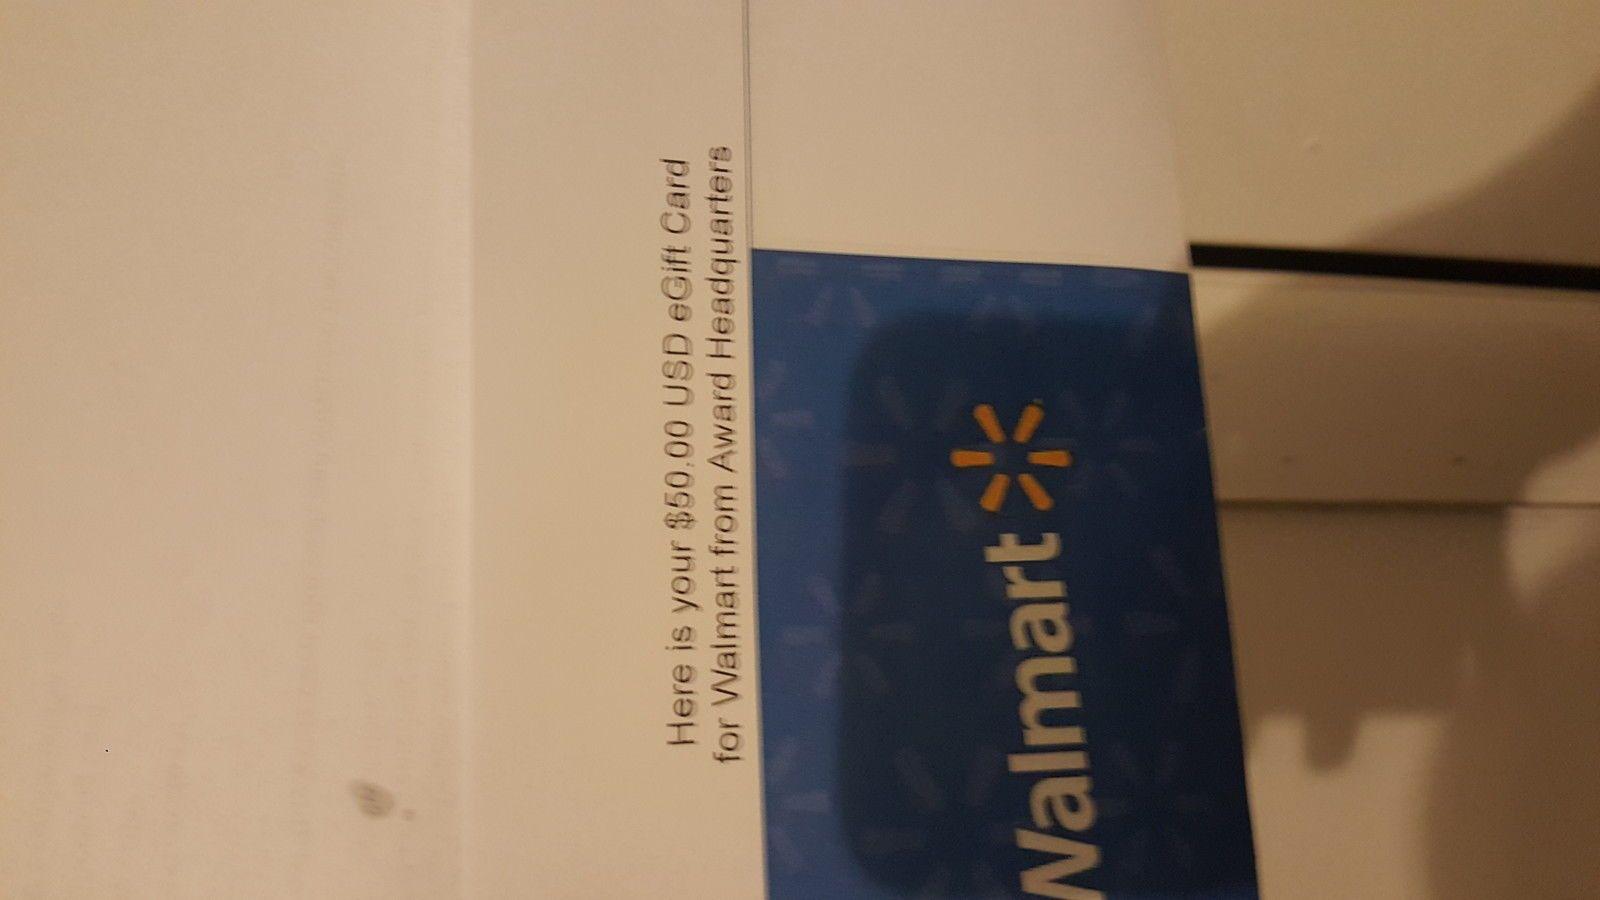 5000 walmart gift card